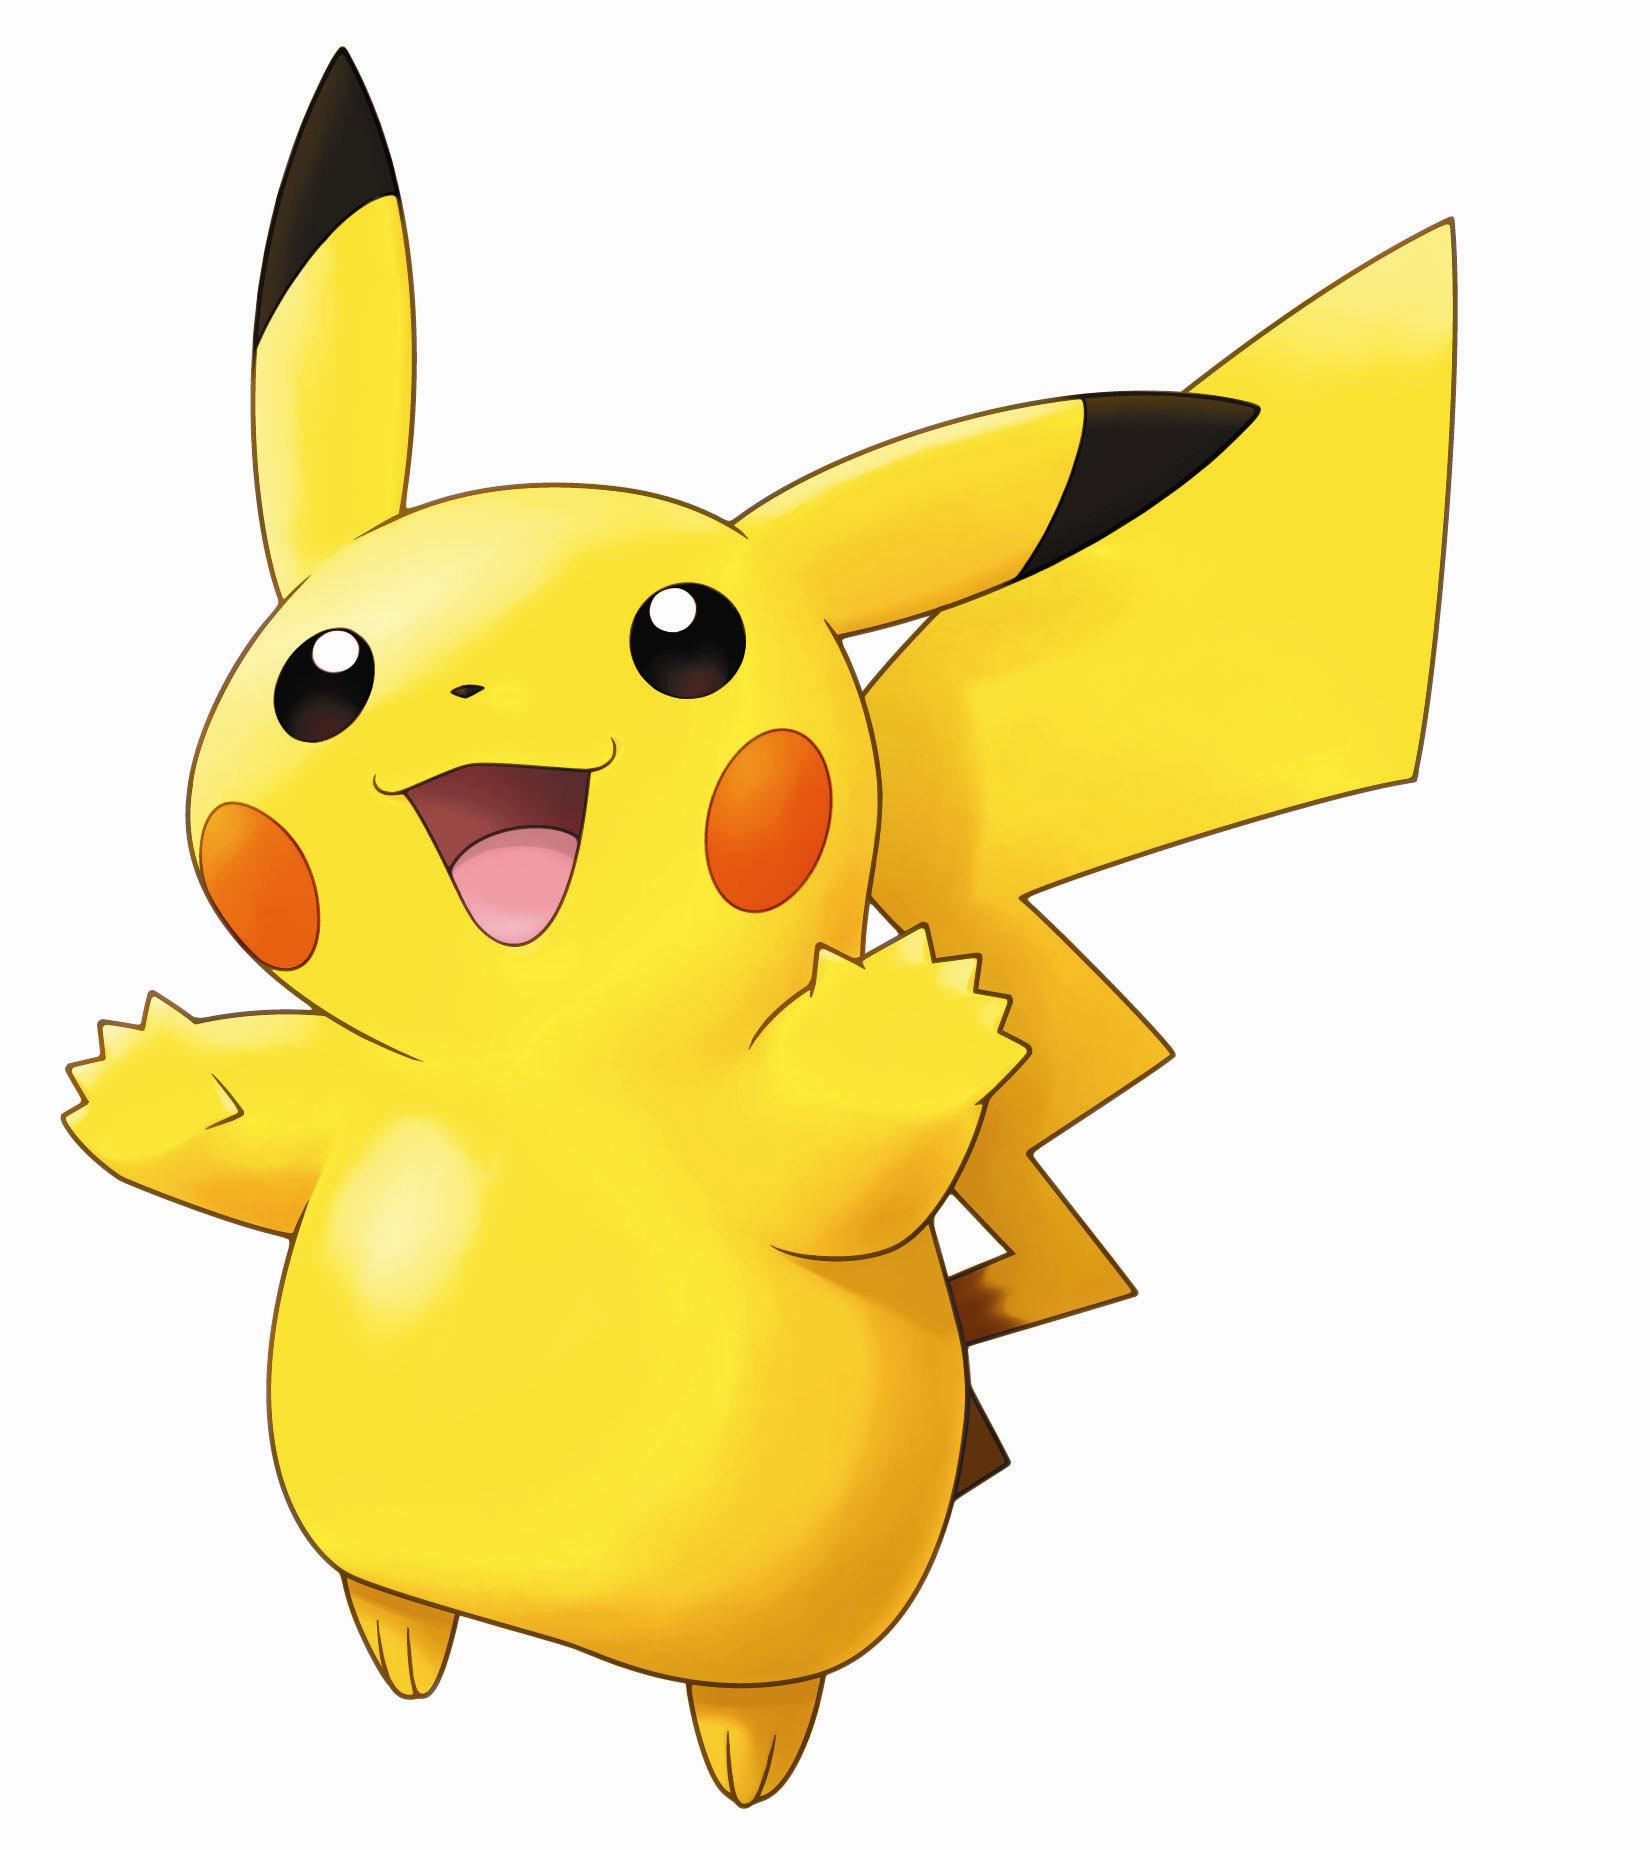 Pikachu clipart original pokemon Pikachu screenshots and pictures